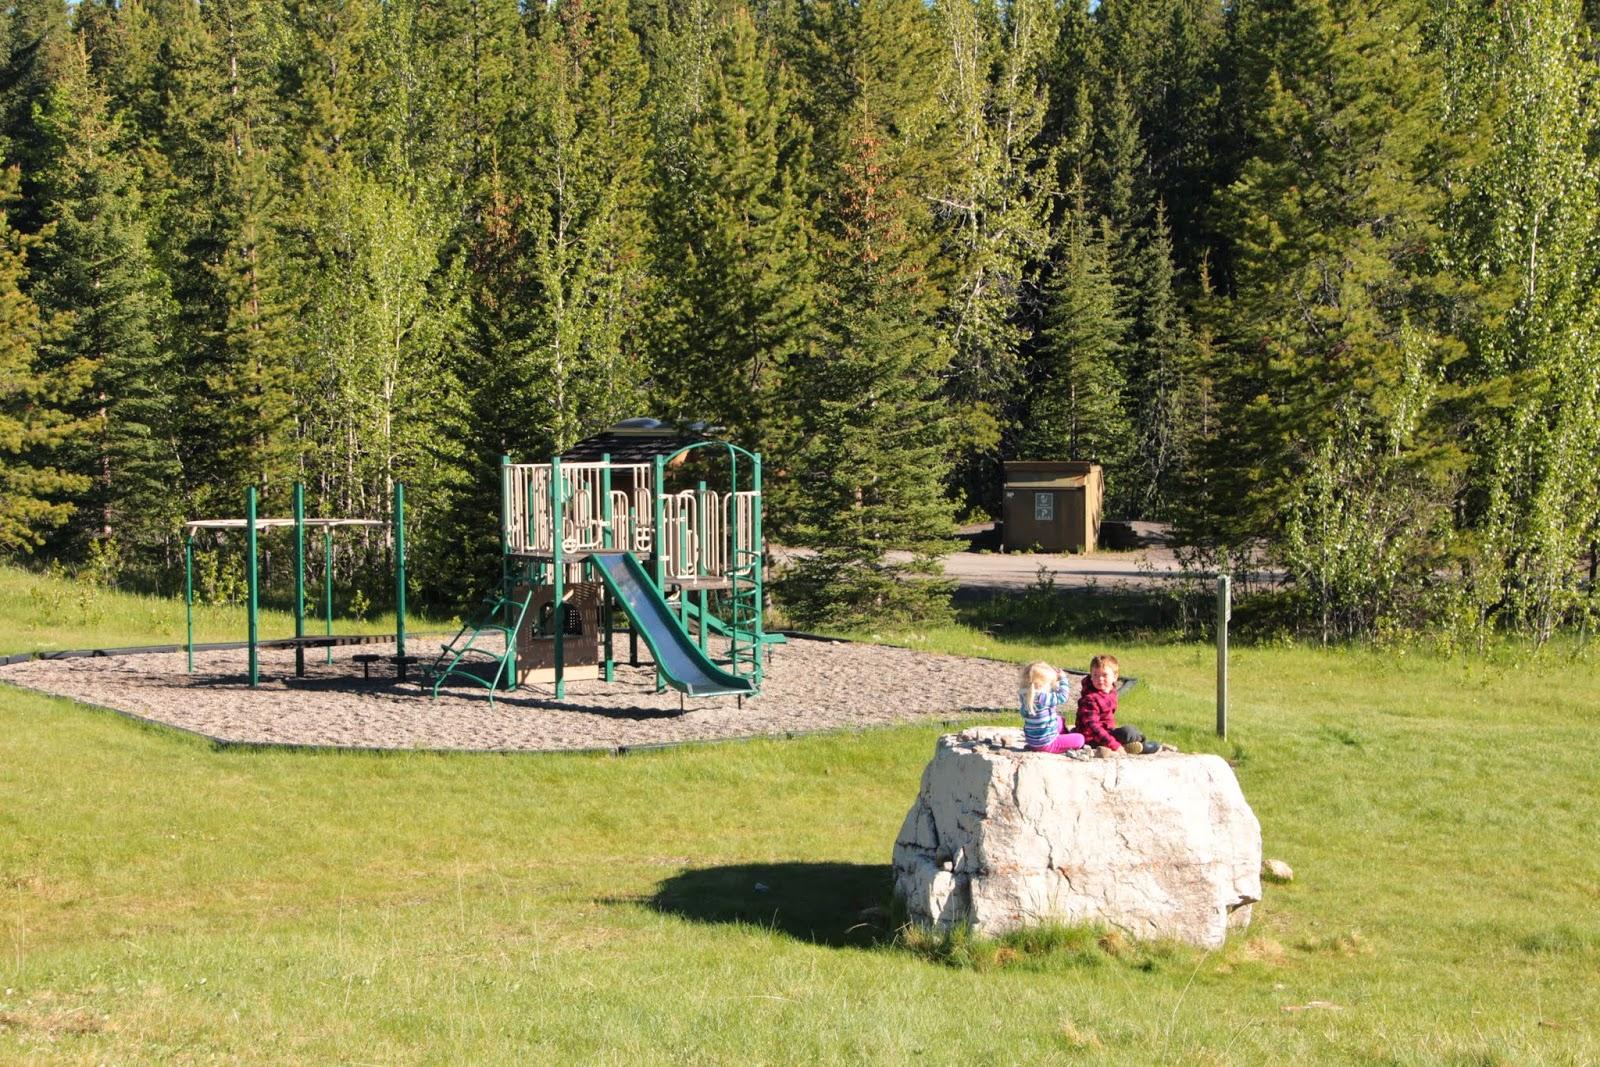 Camping in Albertas Kananaskis Country